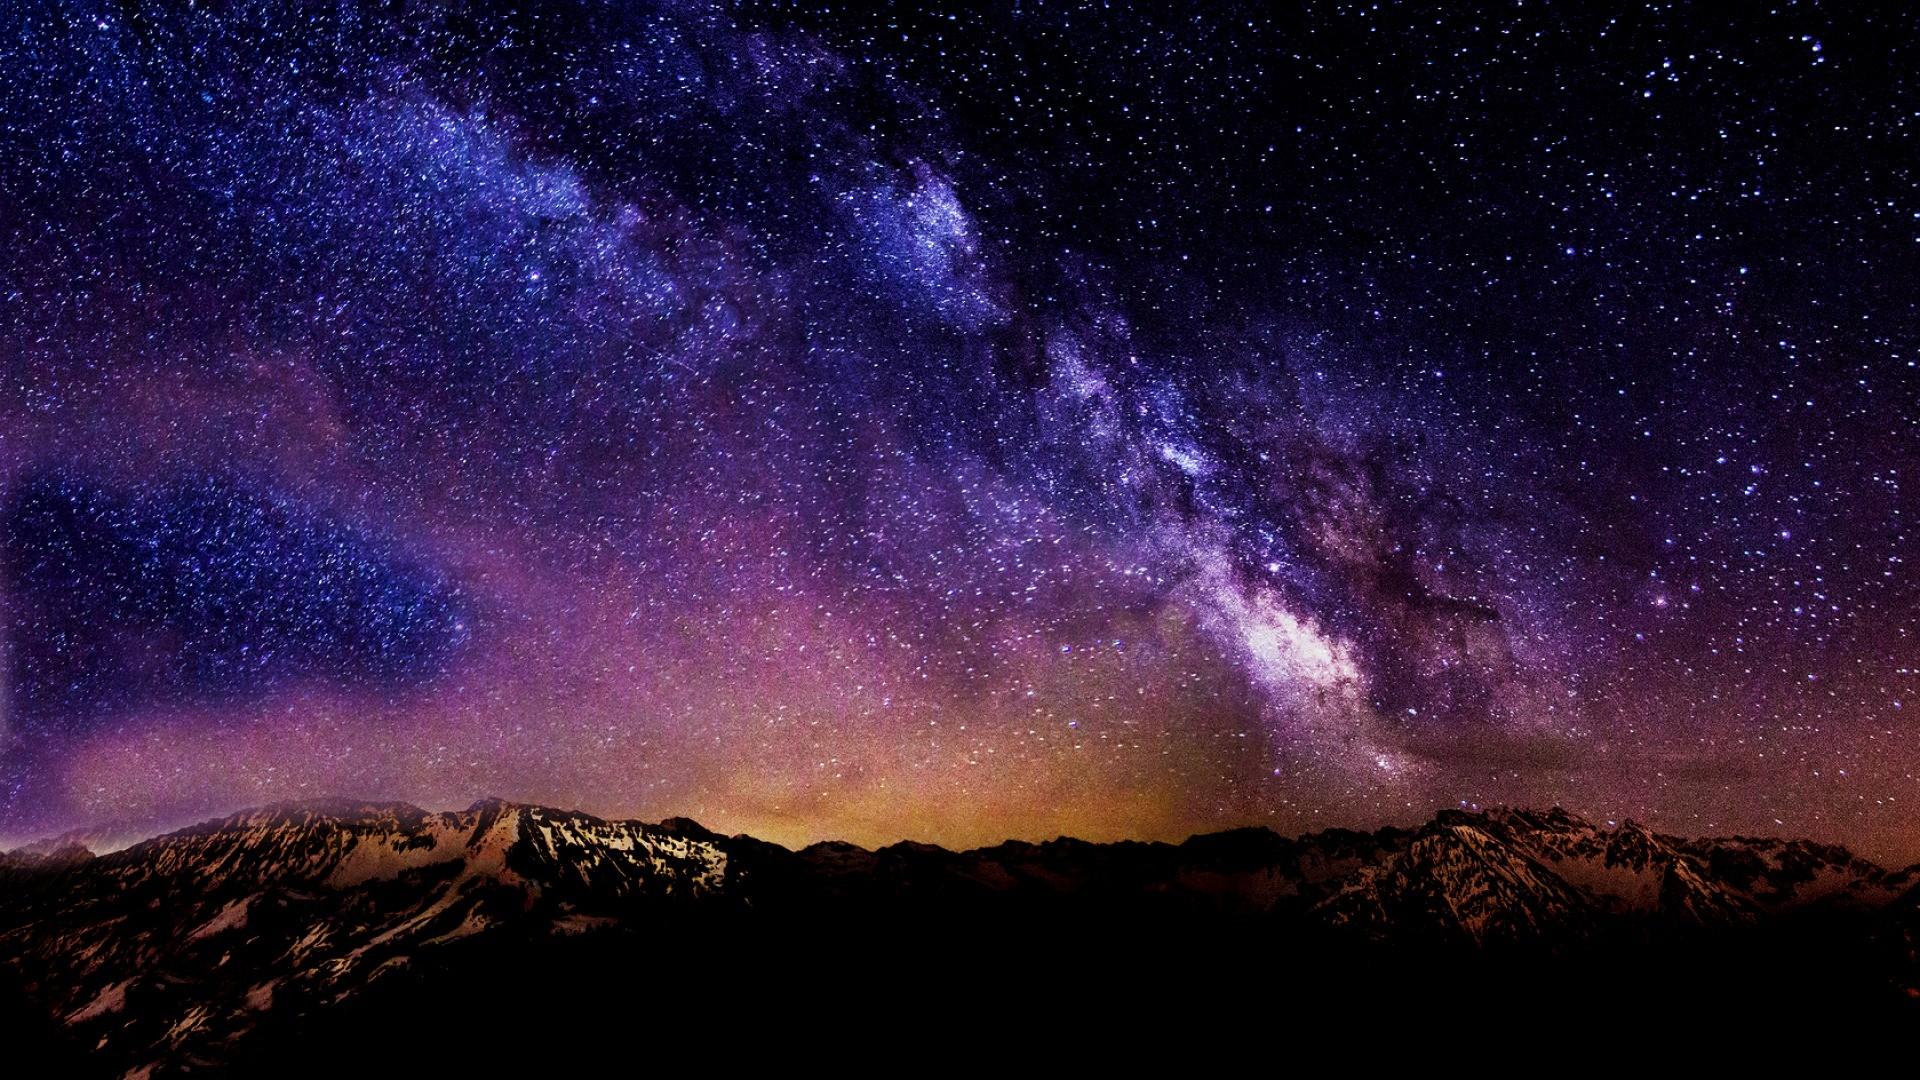 Starry Night Sky Desktop Wallpaper. Night Sky Background Wallpapers | WIN10  THEMES